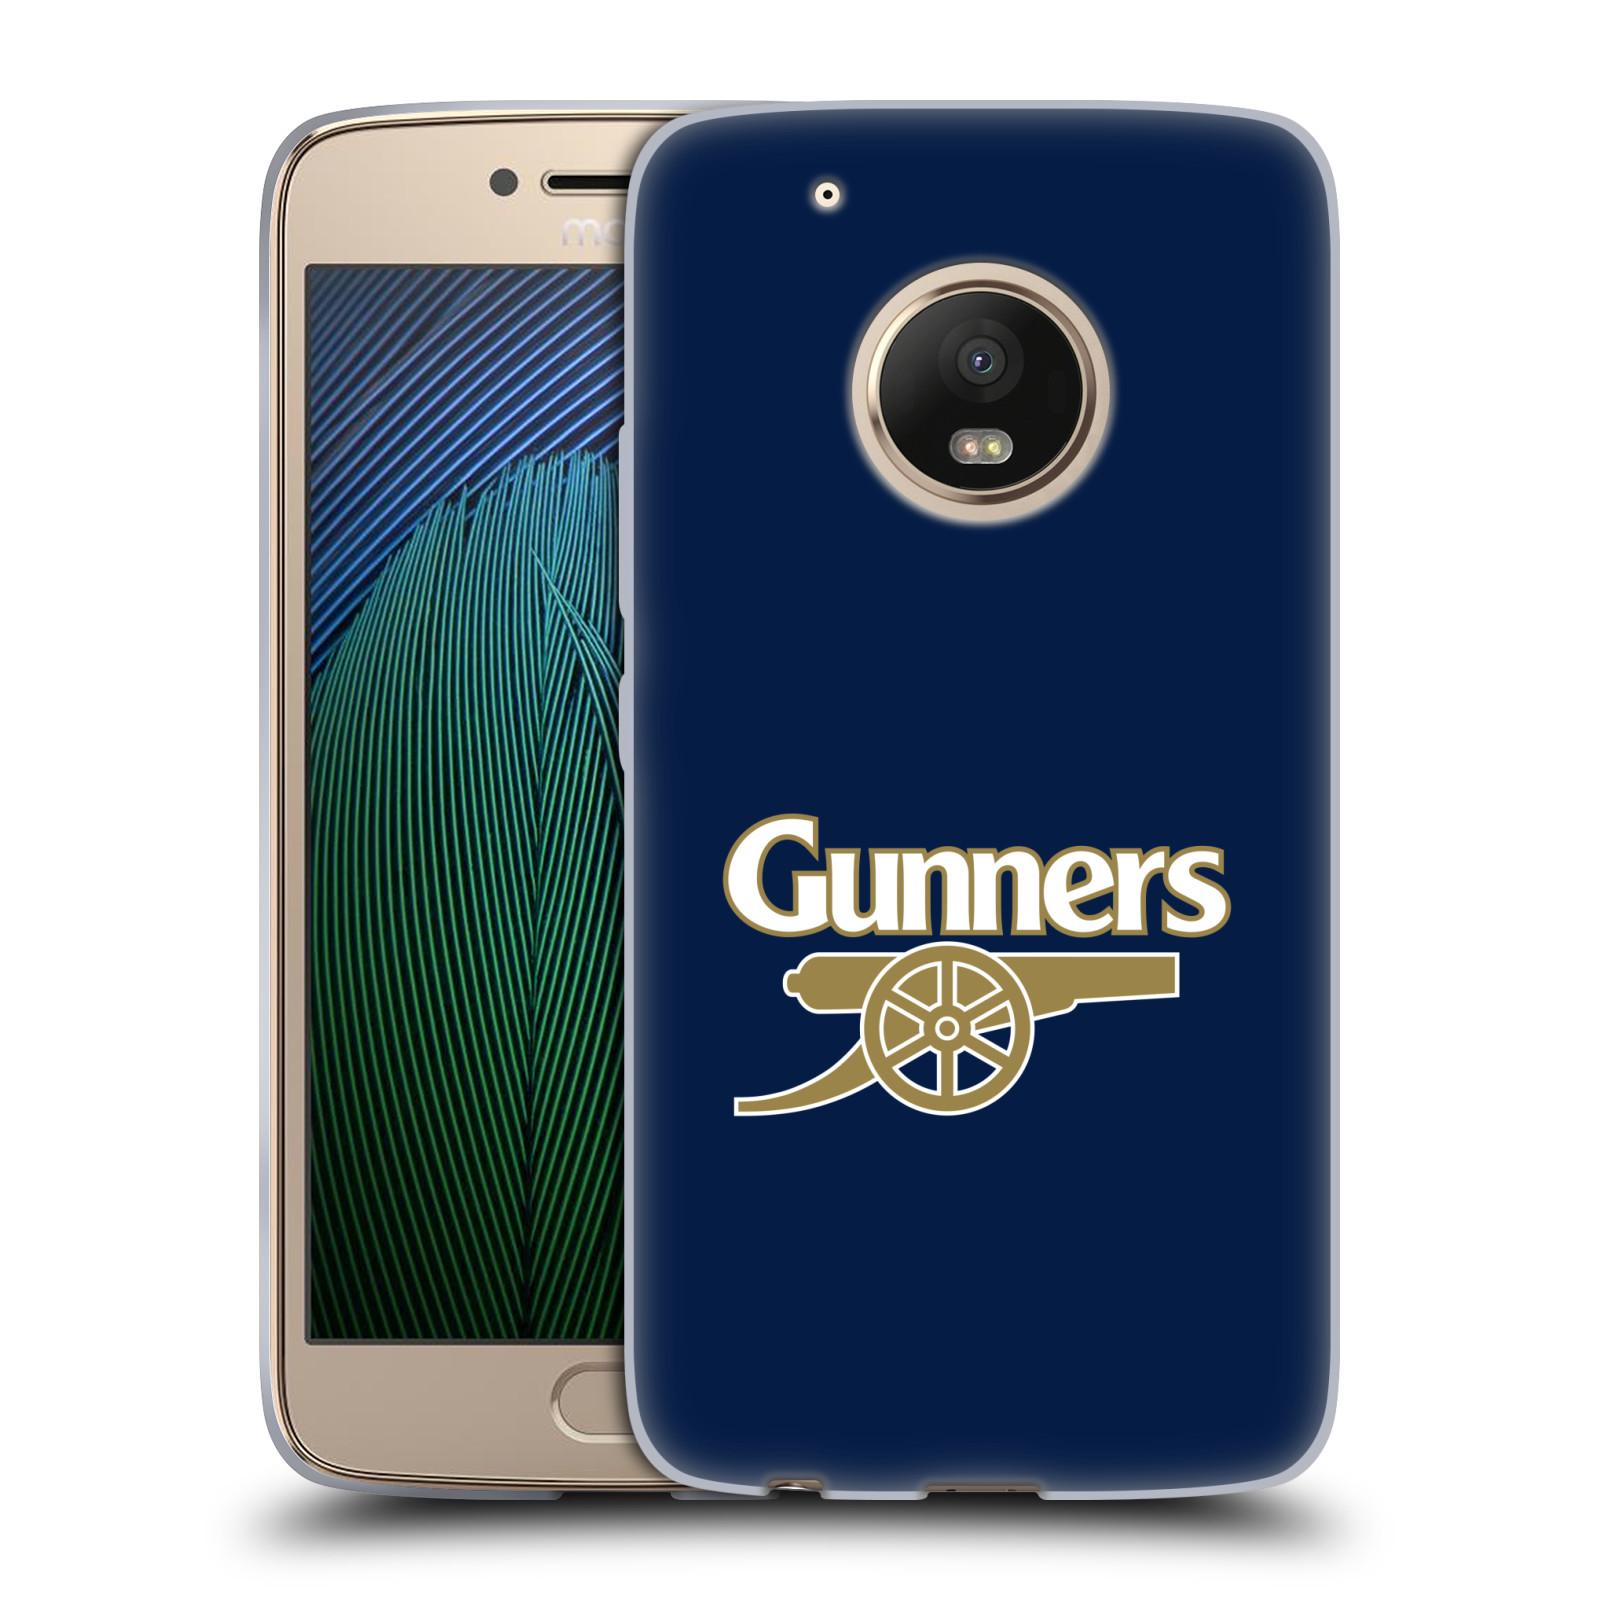 Silikonové pouzdro na mobil Lenovo Moto G5 Plus - Head Case - Arsenal FC - Gunners